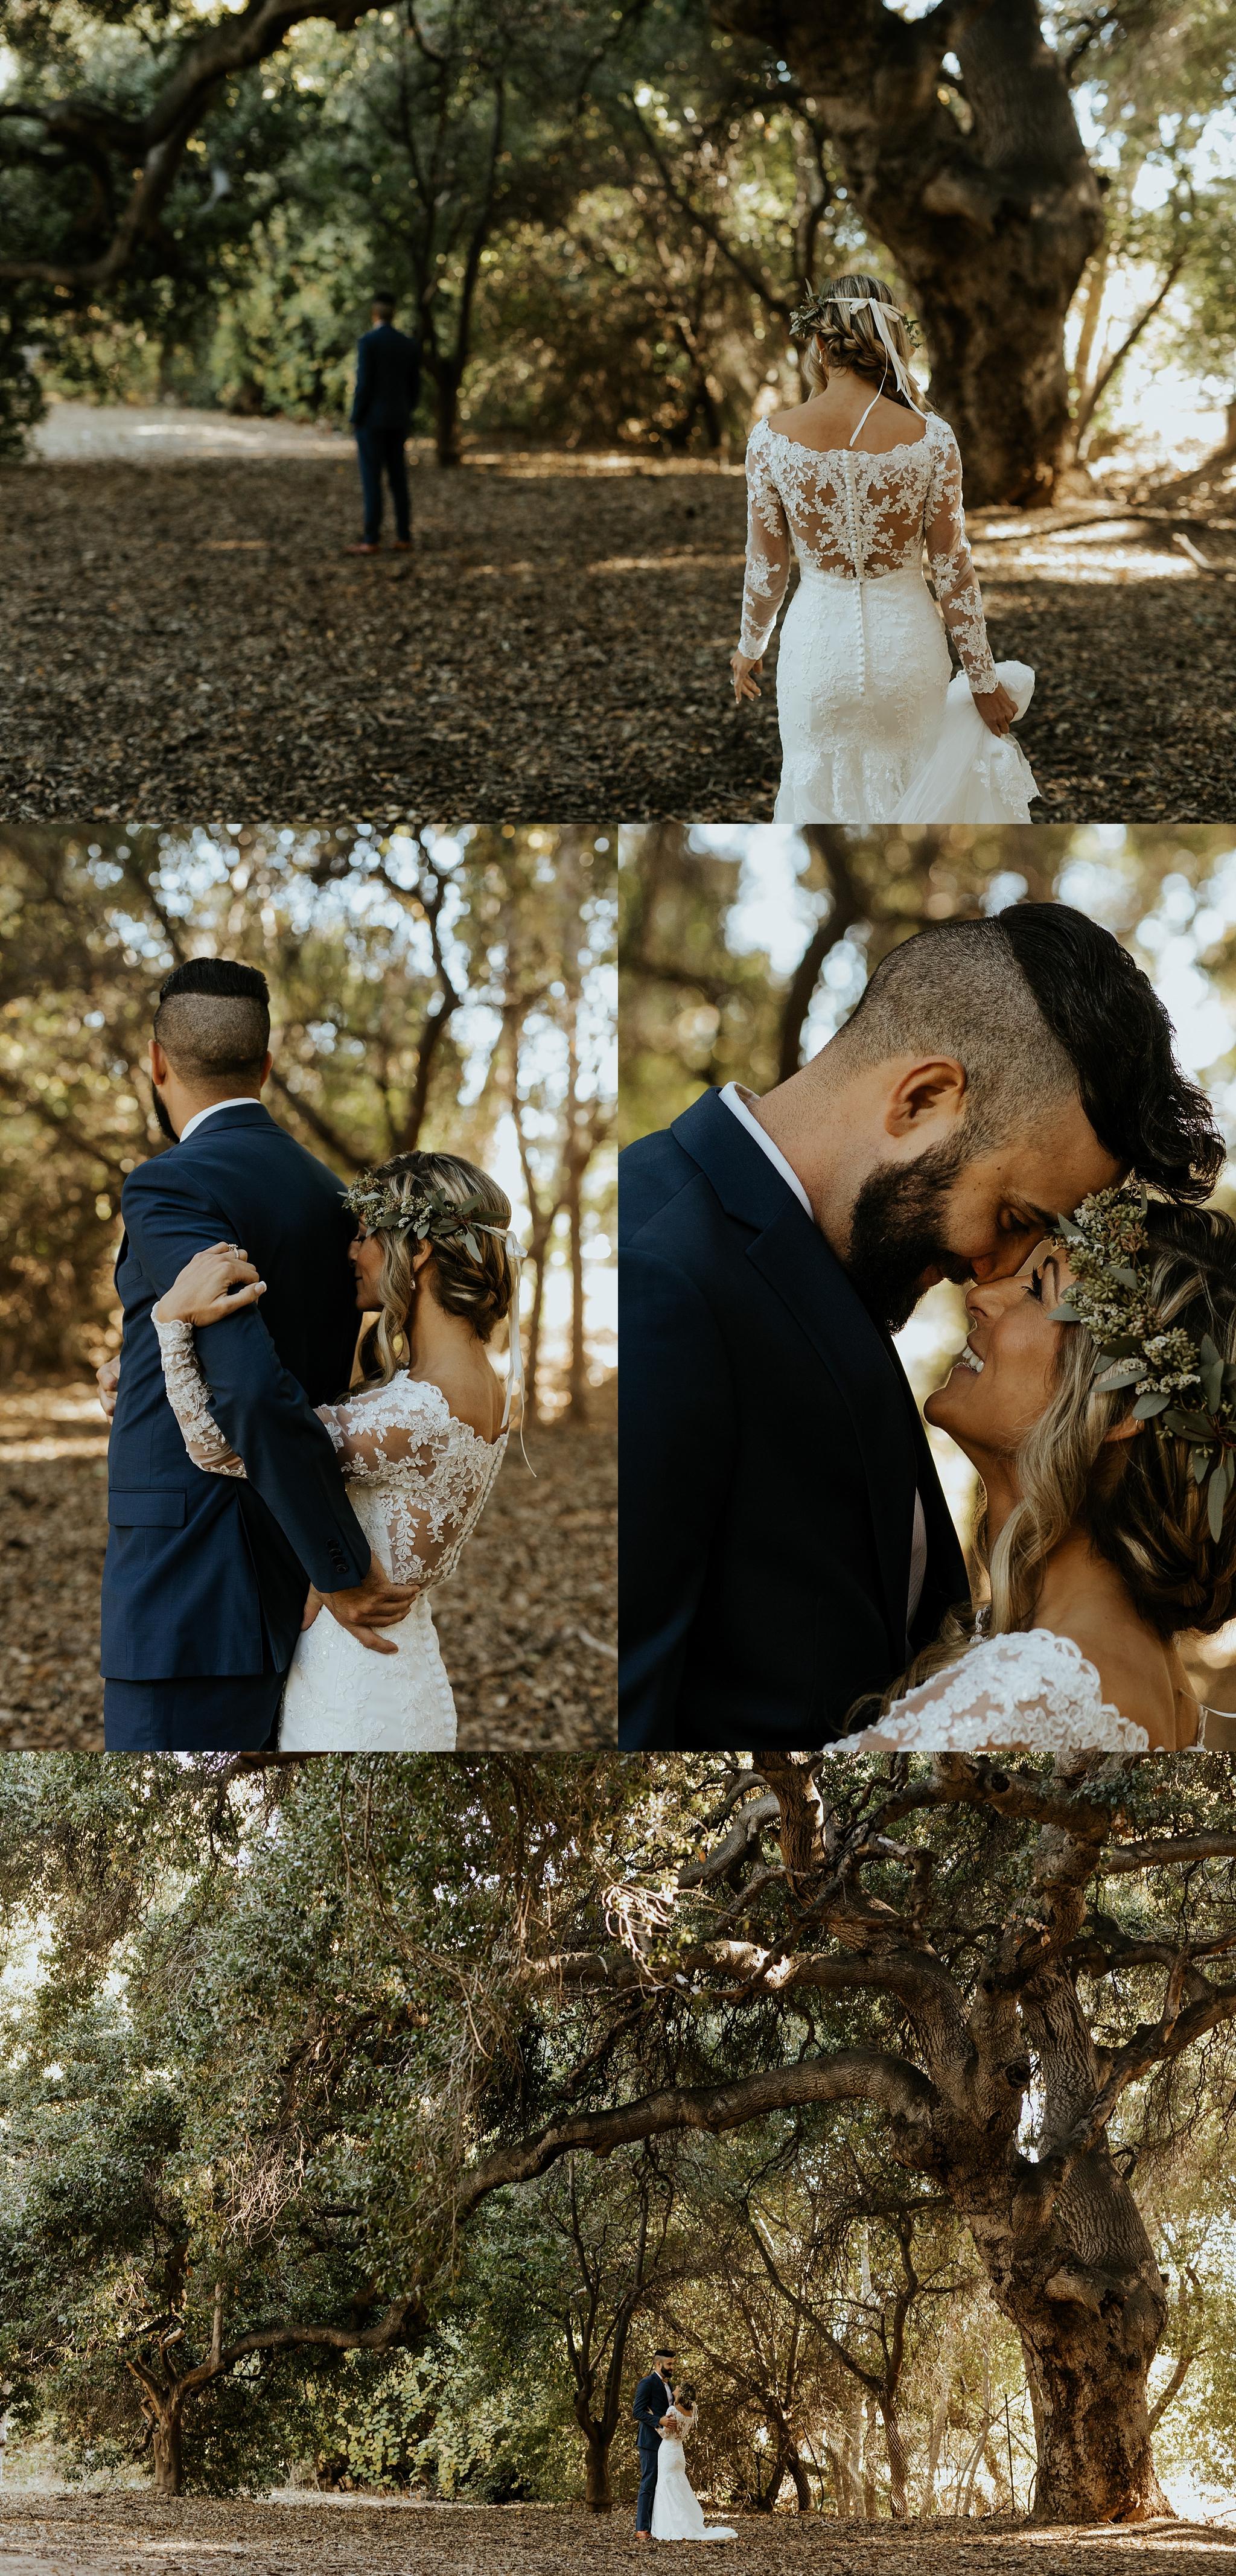 Bohemian Orcutt Ranch Wedding in Los Angeles California  - Los Angeles Californai Wedding Photographer_0071.jpg